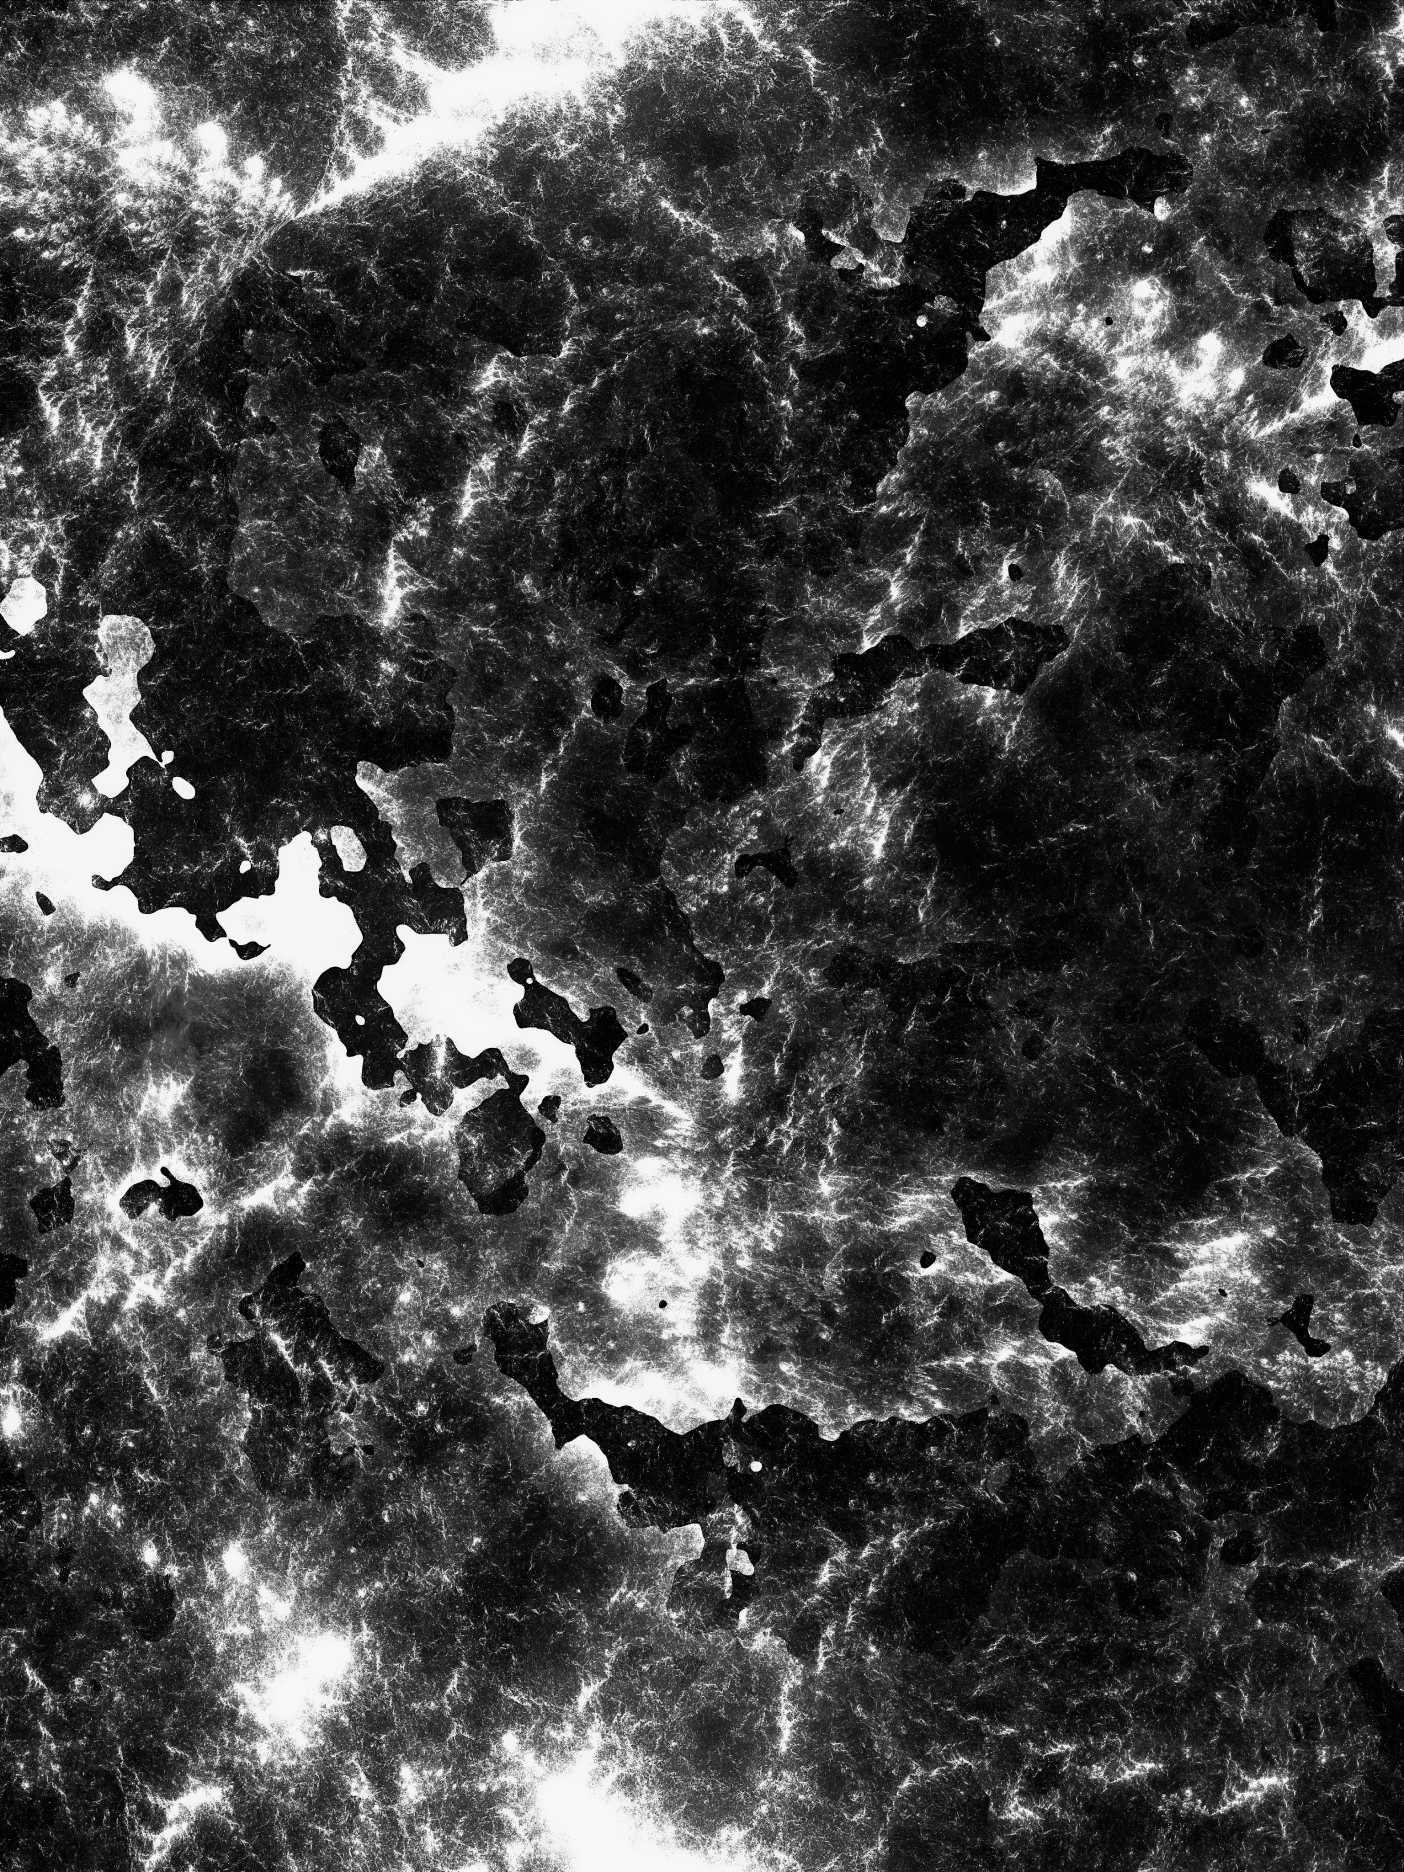 alexis-foucault-topography-x2